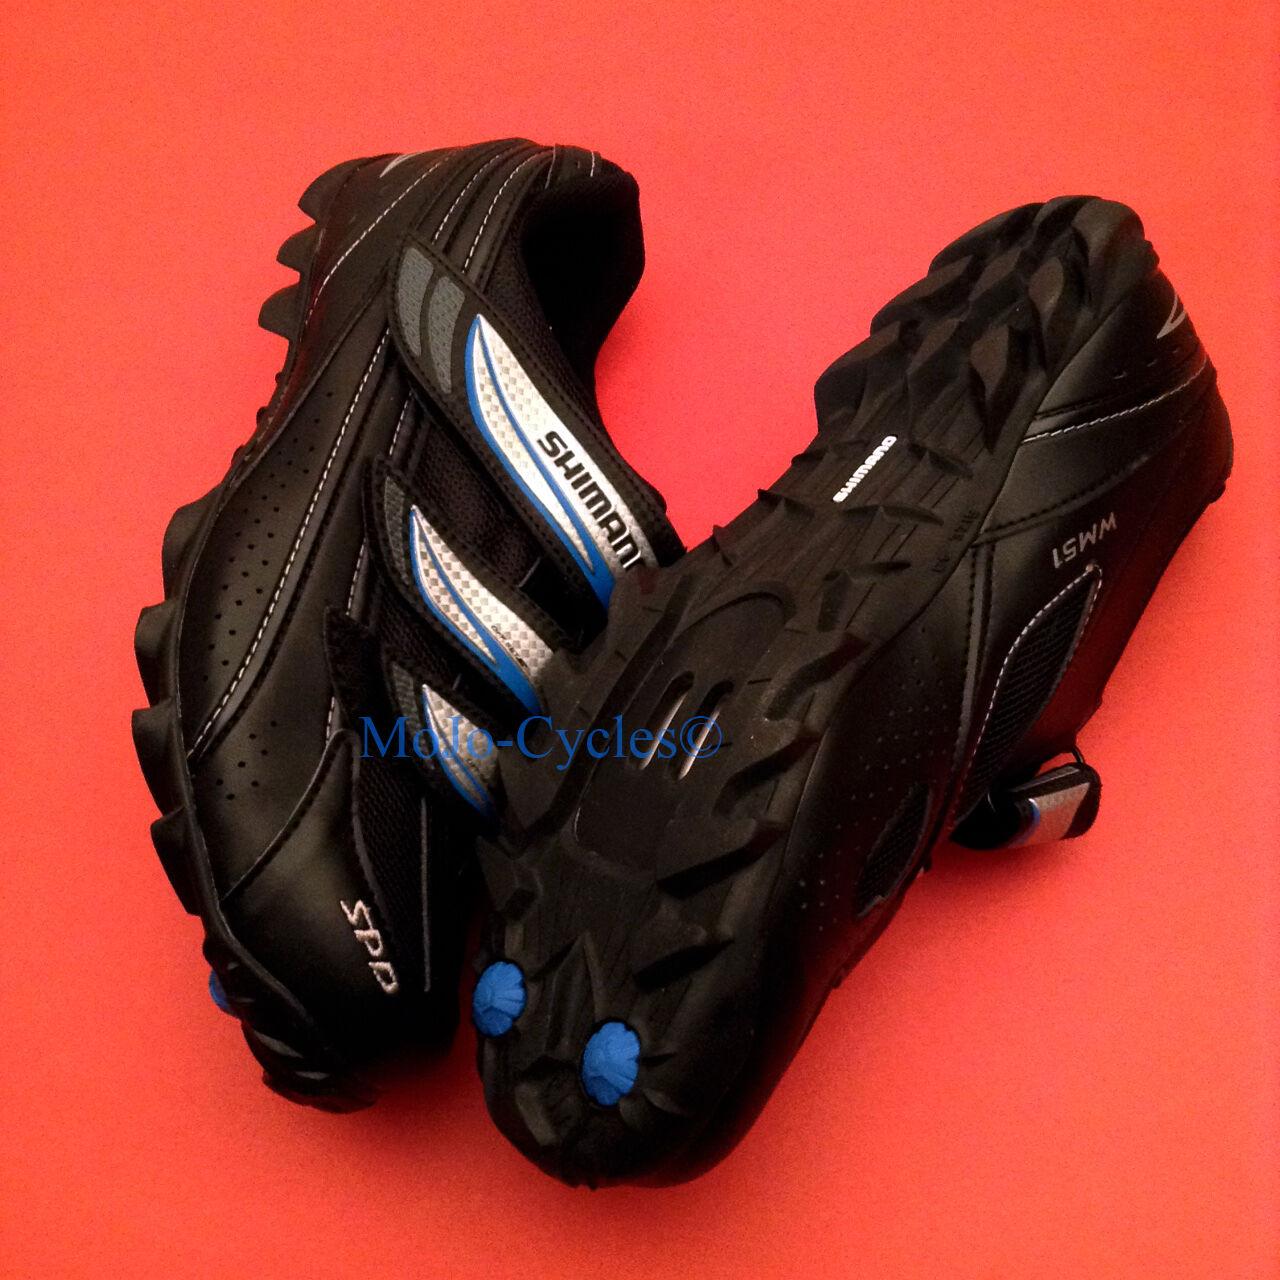 Shimano Donna WM51 scarpe US size 10.4 (10.5) EU 43 SPD Nuovo